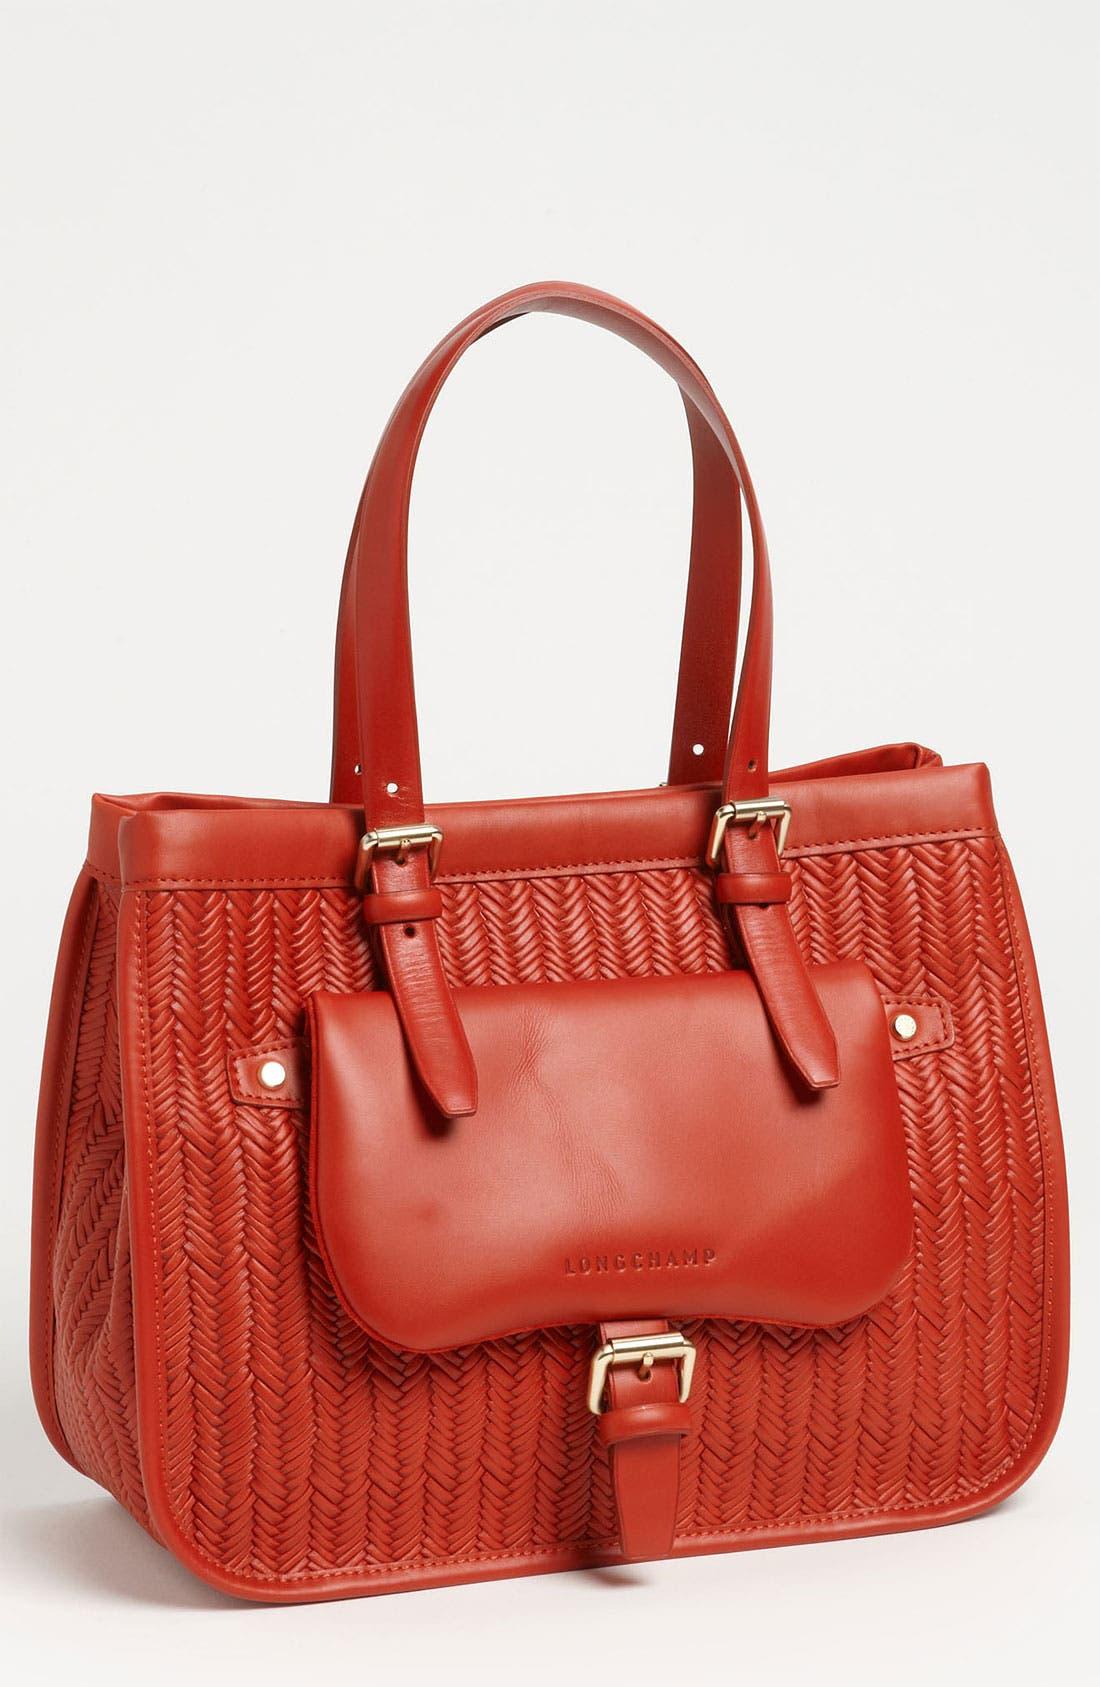 Main Image - Longchamp 'Balzane Paille' Shoulder Tote